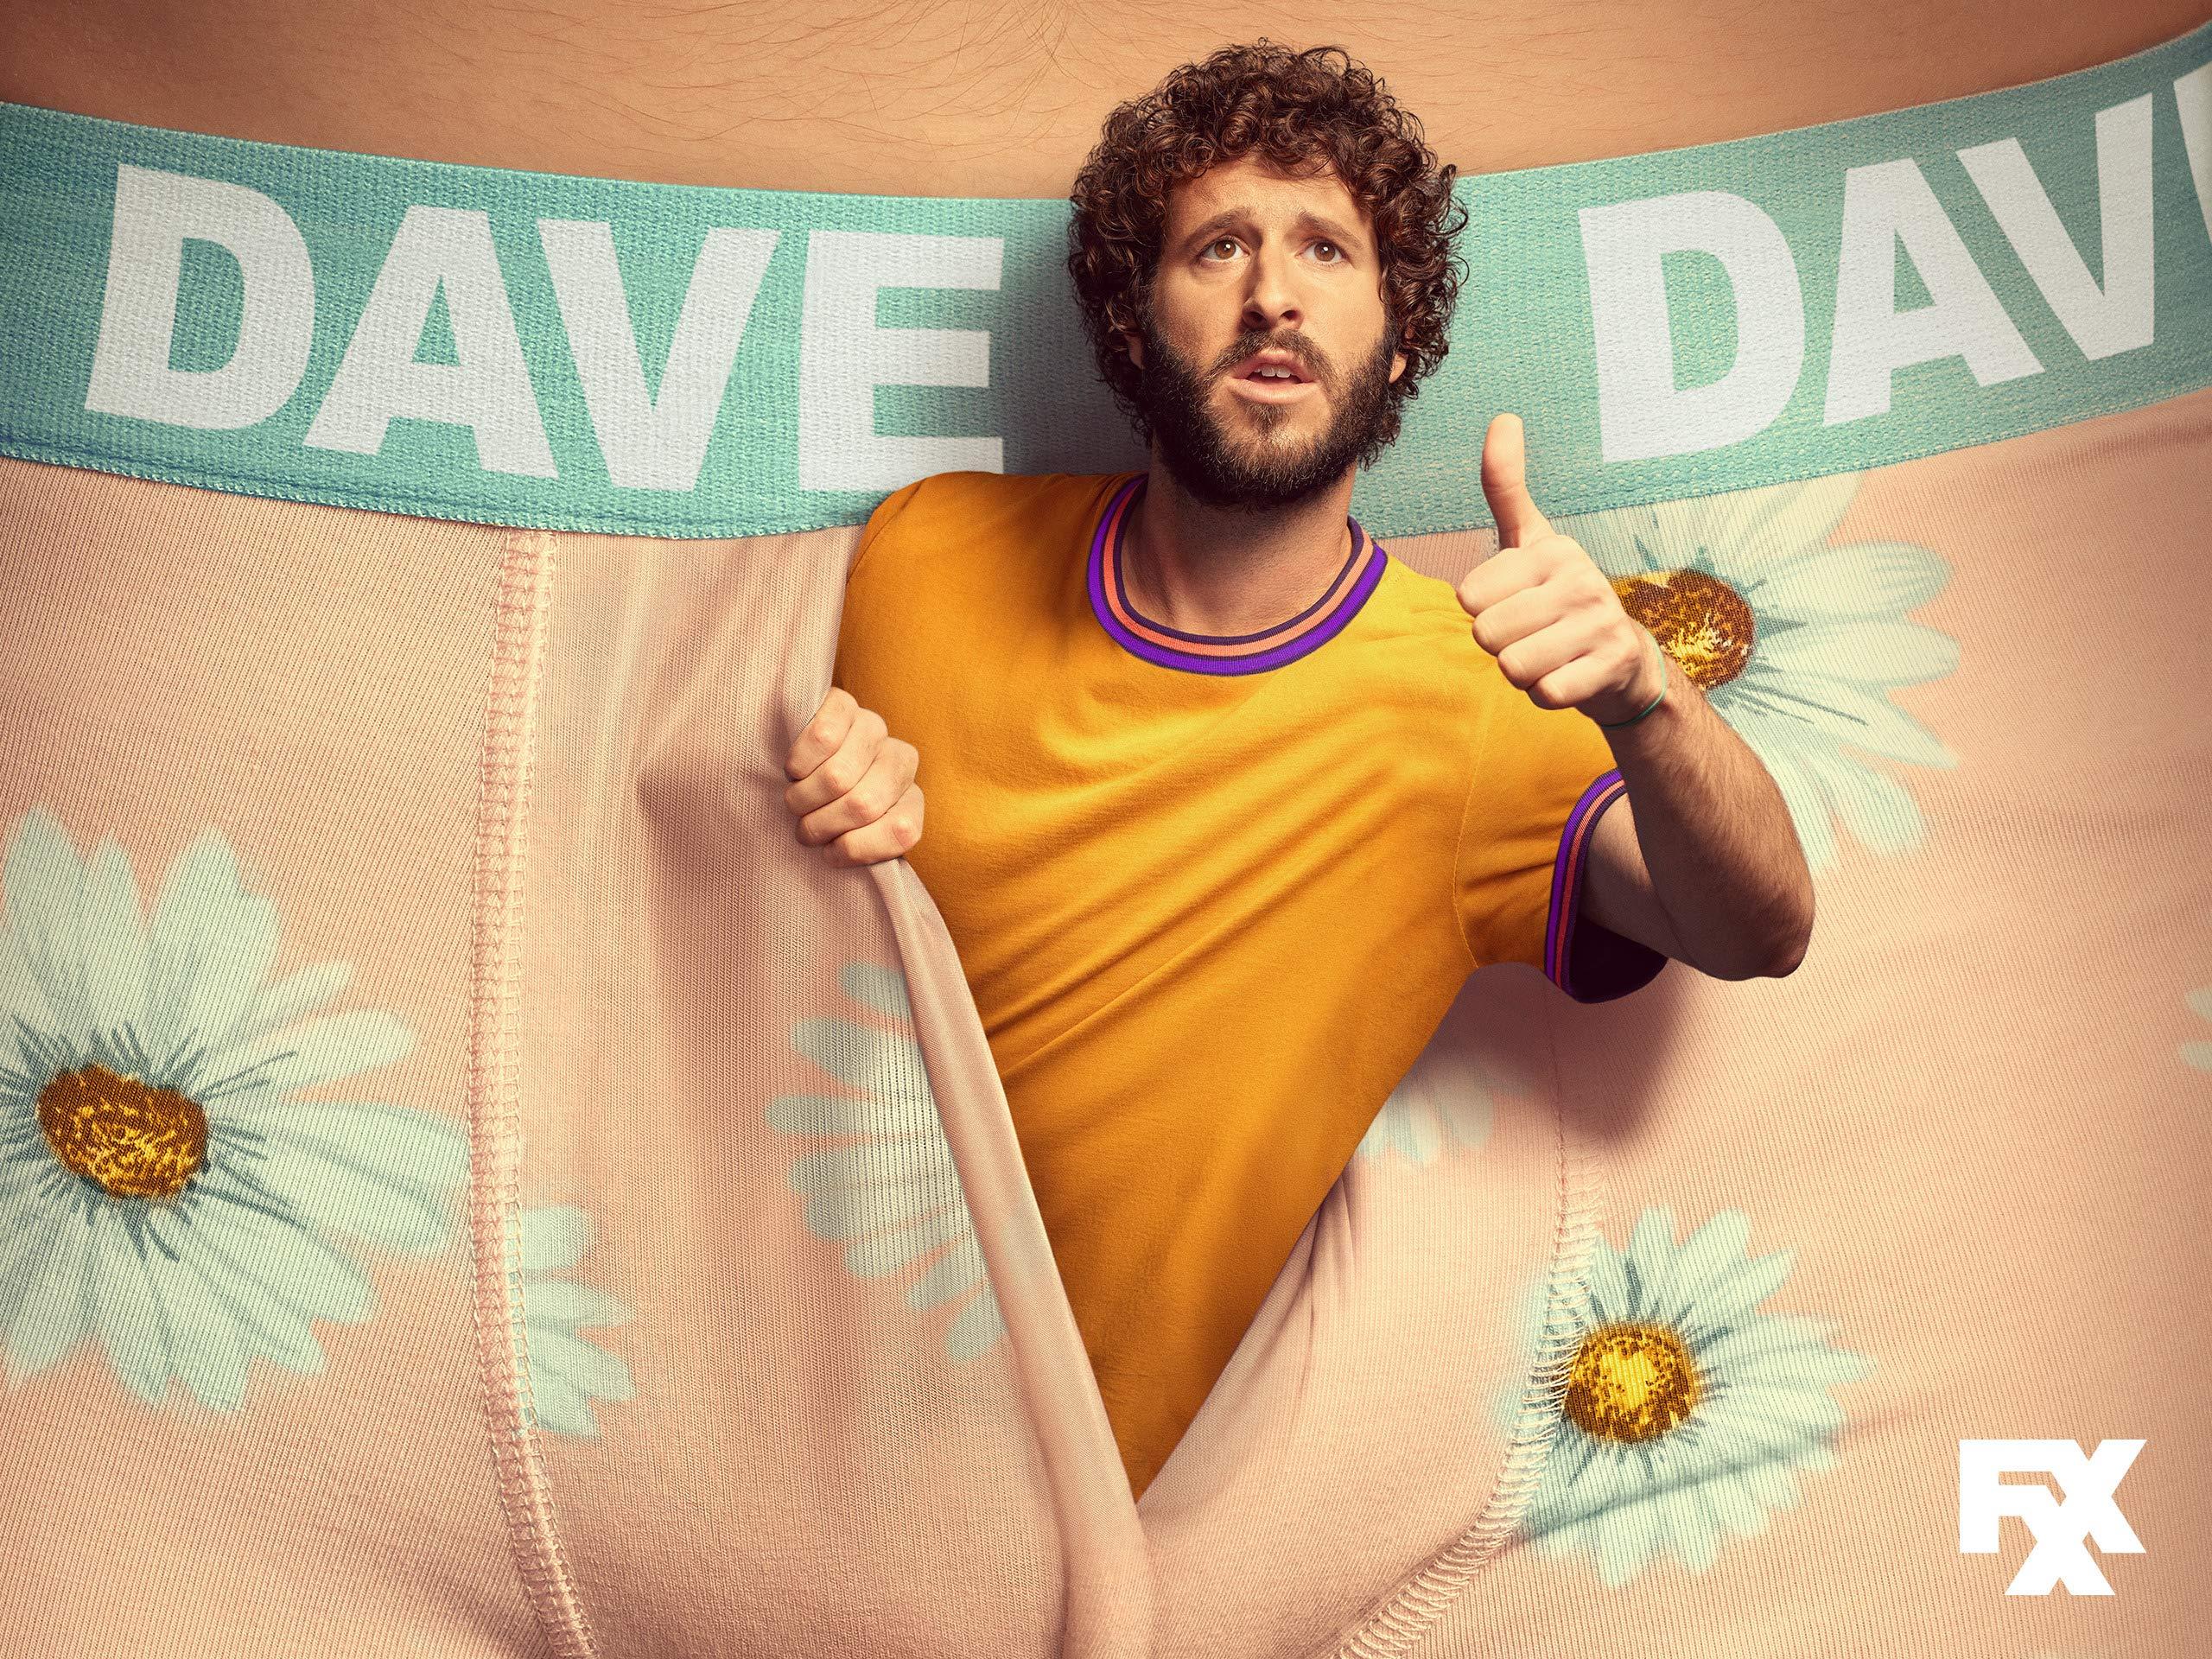 Dave season 2 release date